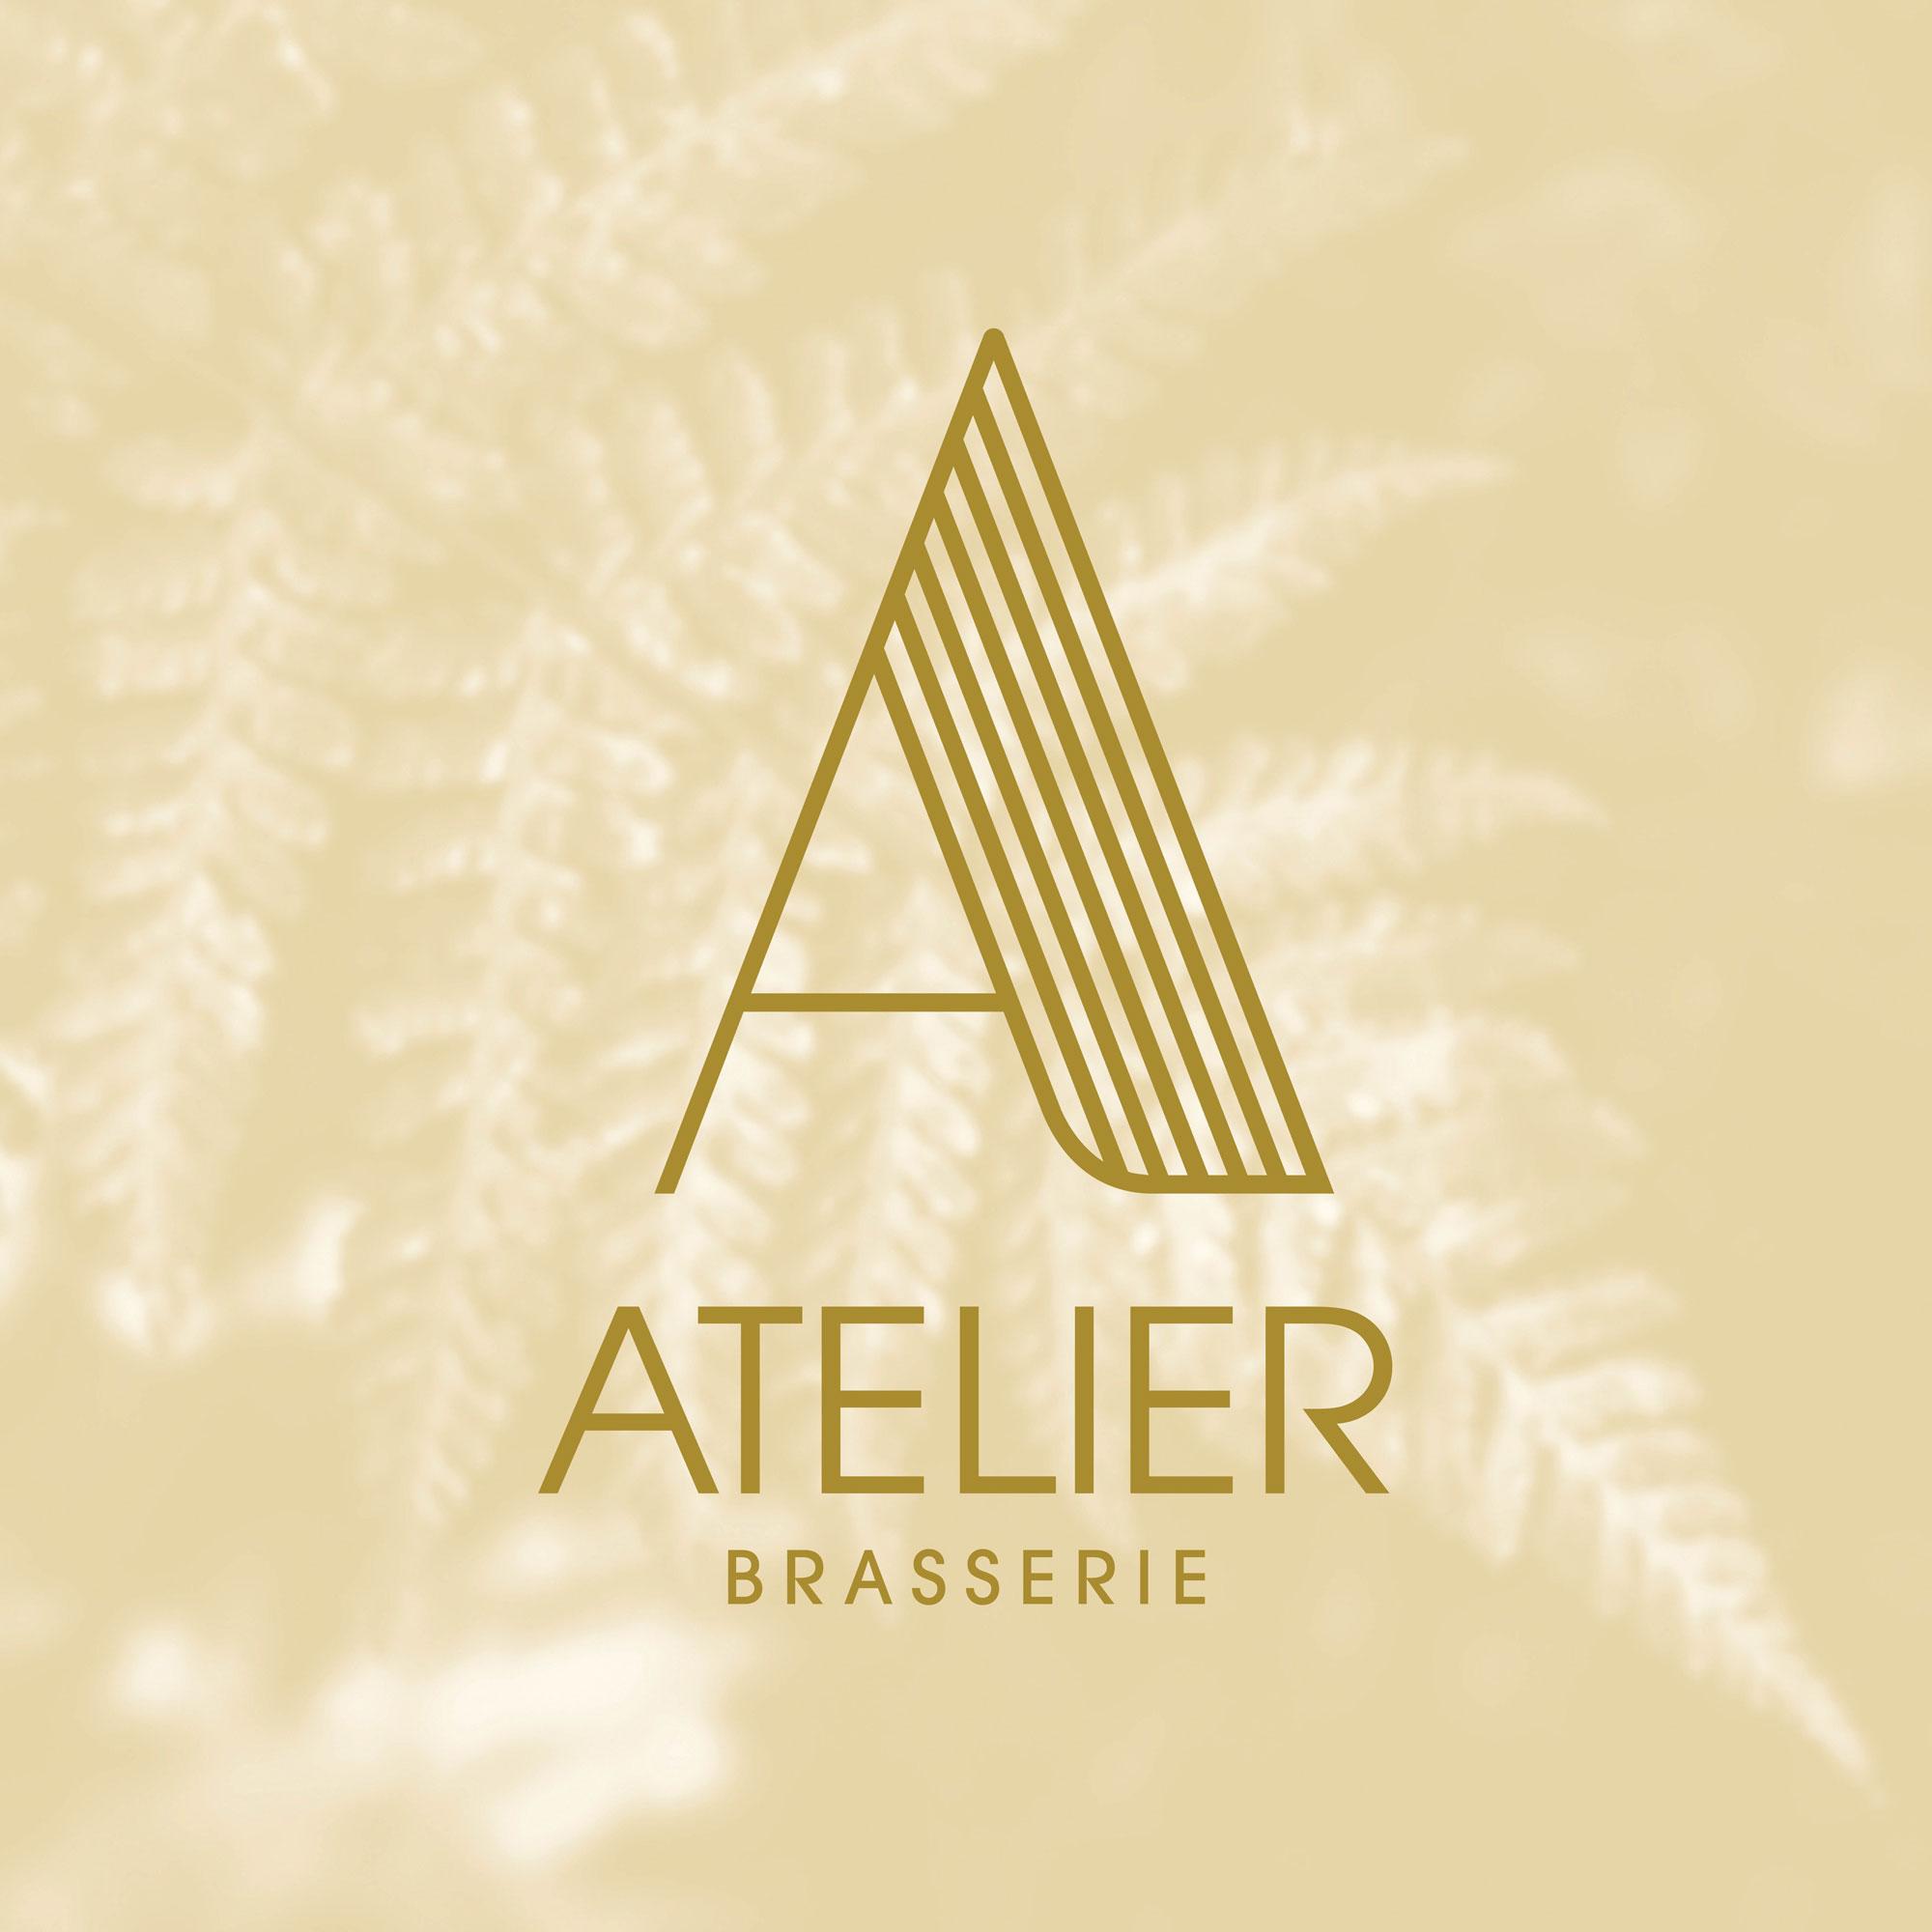 AtelierBrasserieStackedLogoBG2.jpg